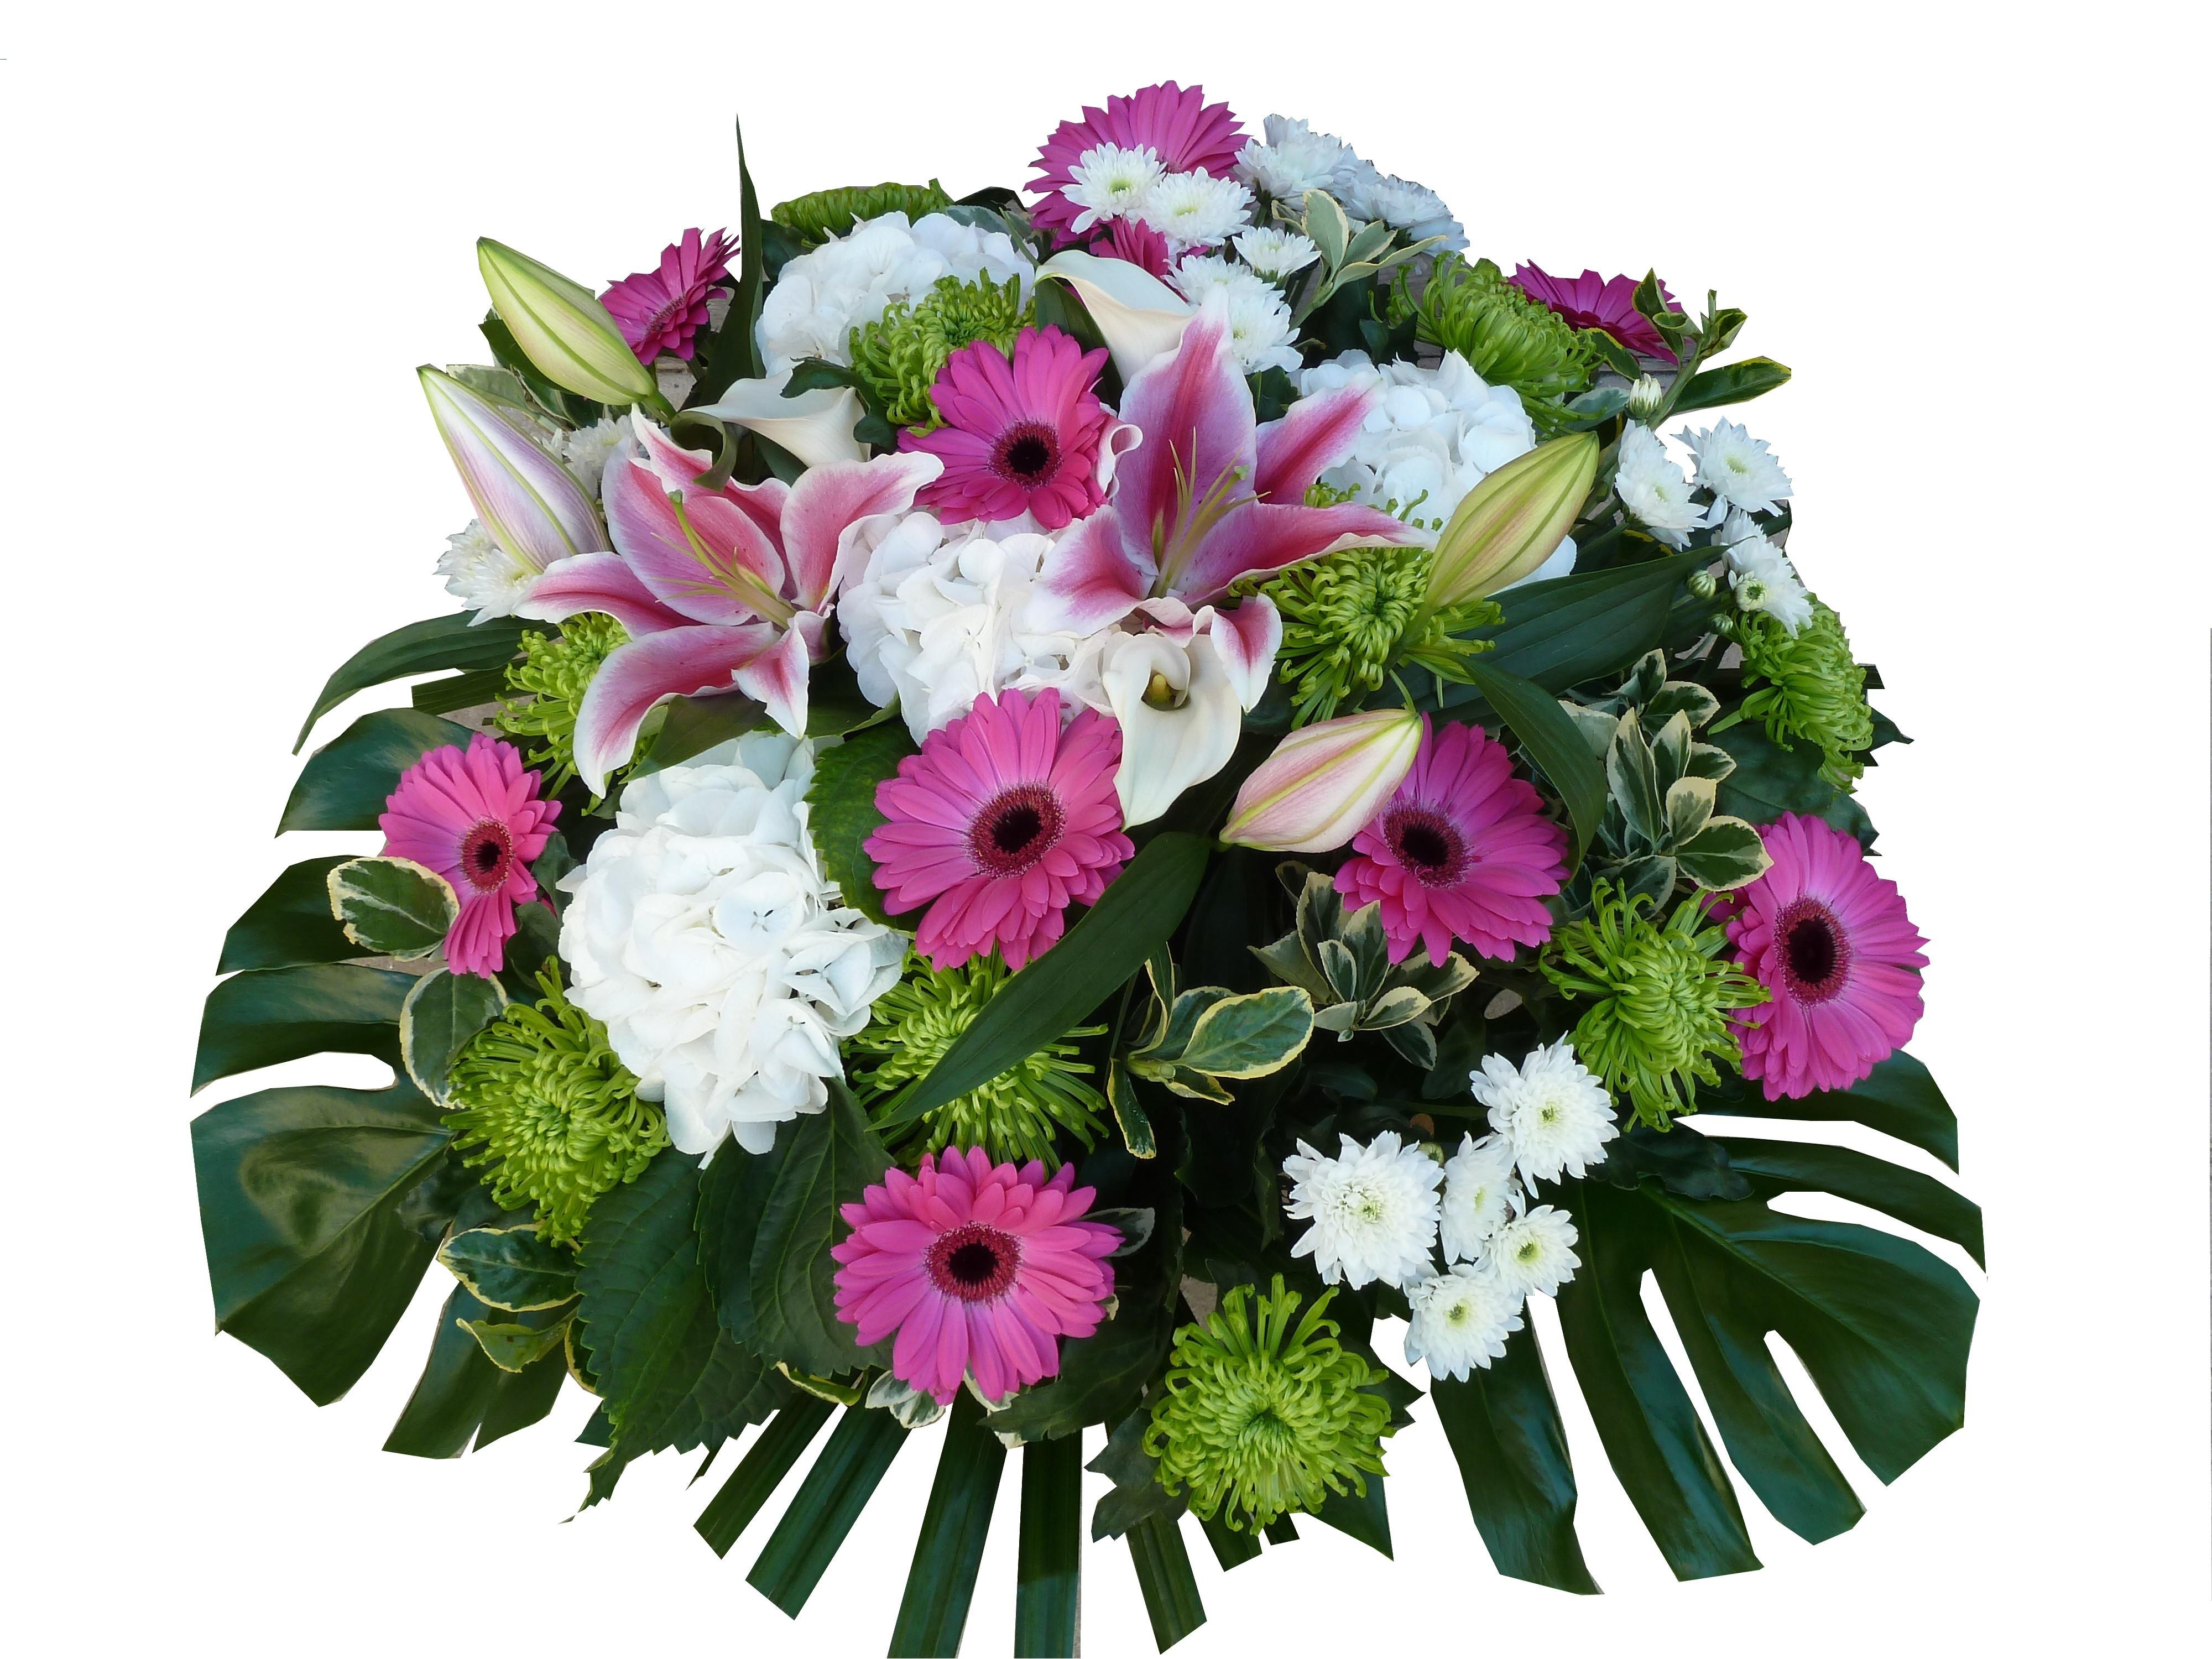 envoi de fleurs funerailles a gleize arnas villefranche sur saone florafrance. Black Bedroom Furniture Sets. Home Design Ideas